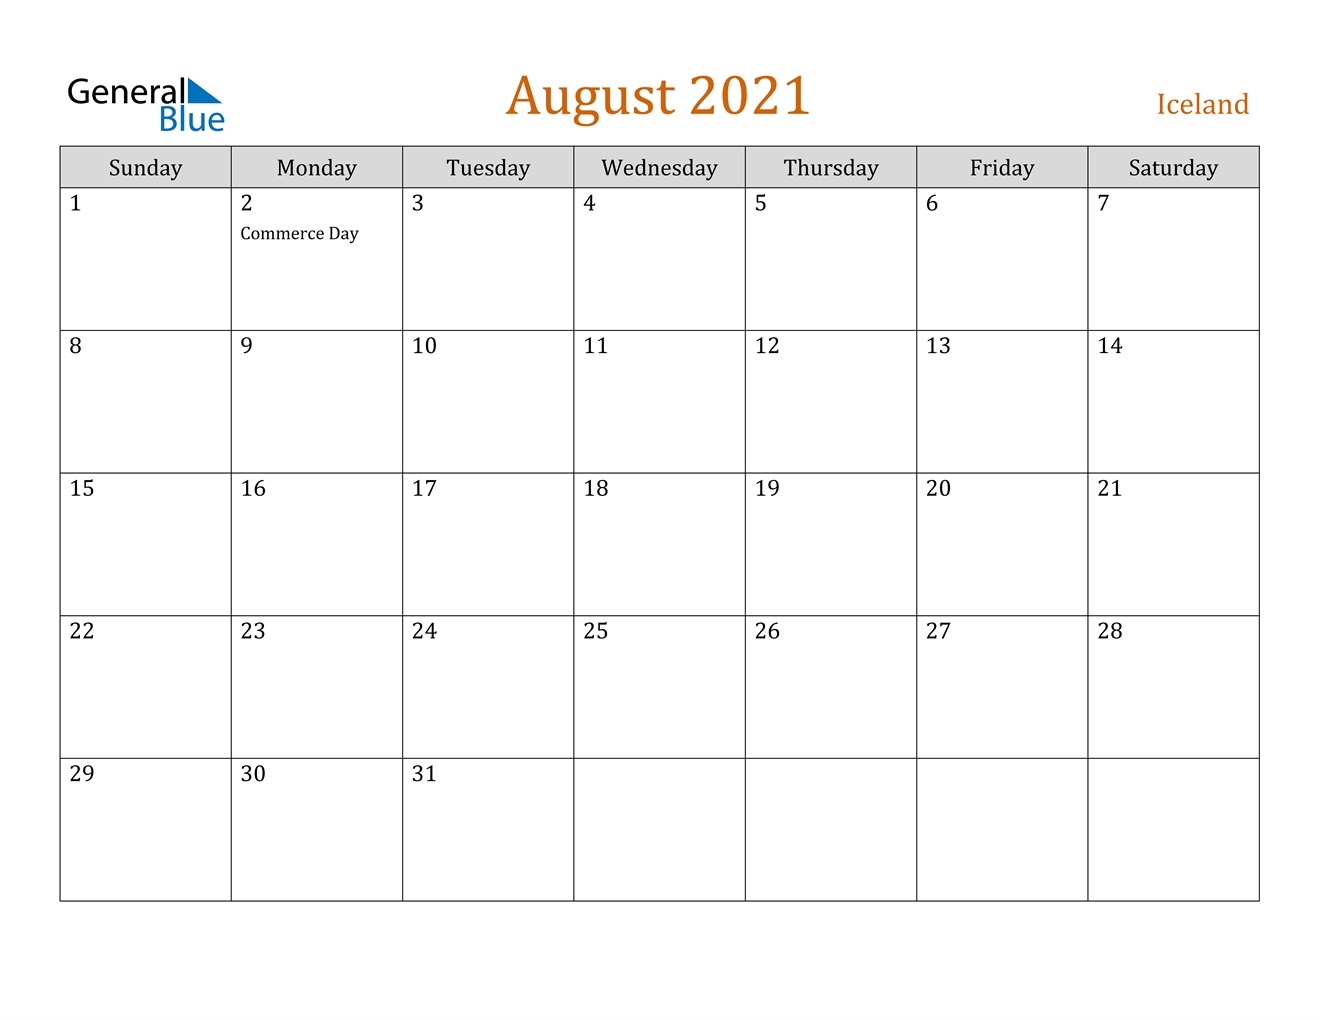 August 2021 Calendar - Iceland August 2021 Calendar Images